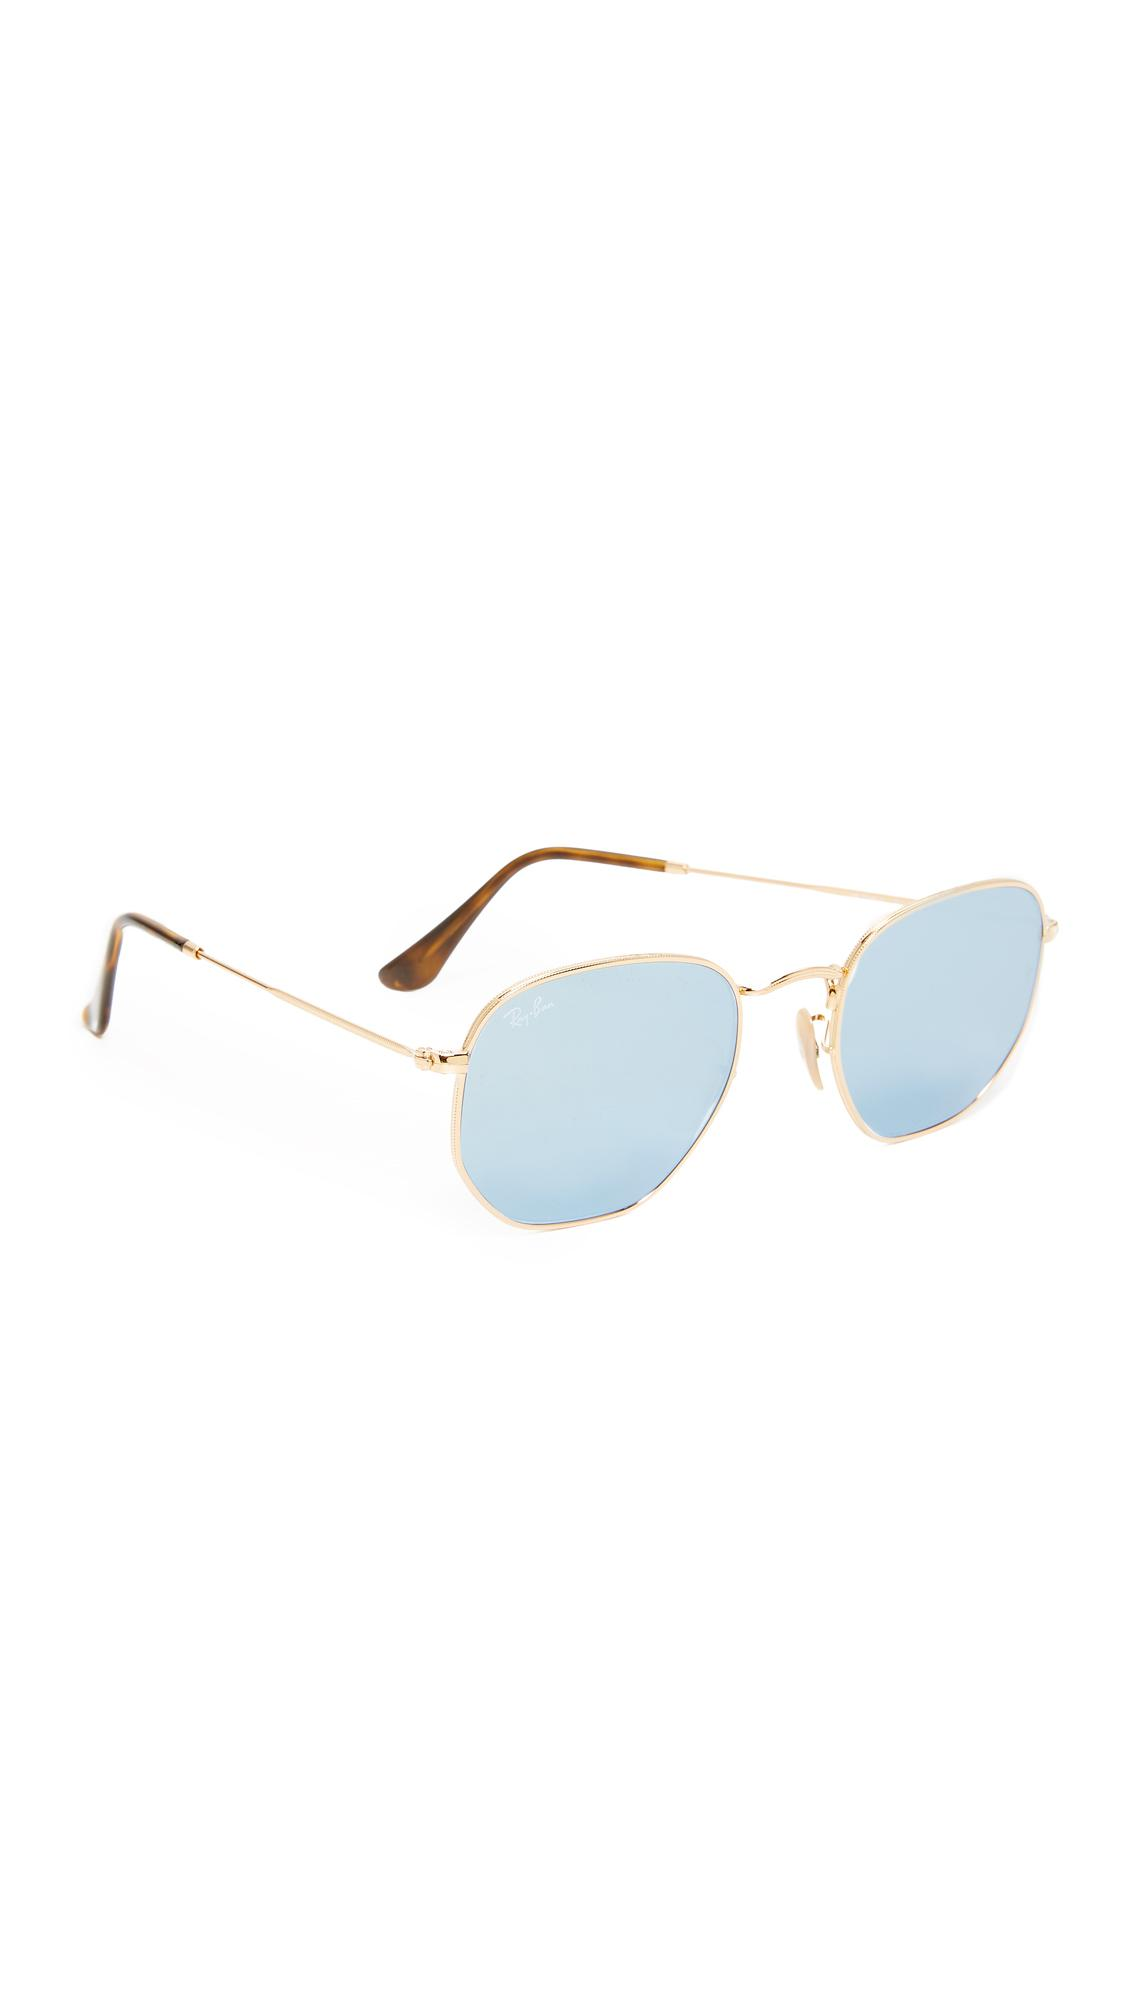 bdcae936264e Lyst - Ray-Ban Hexagonal Sunglasses in Metallic